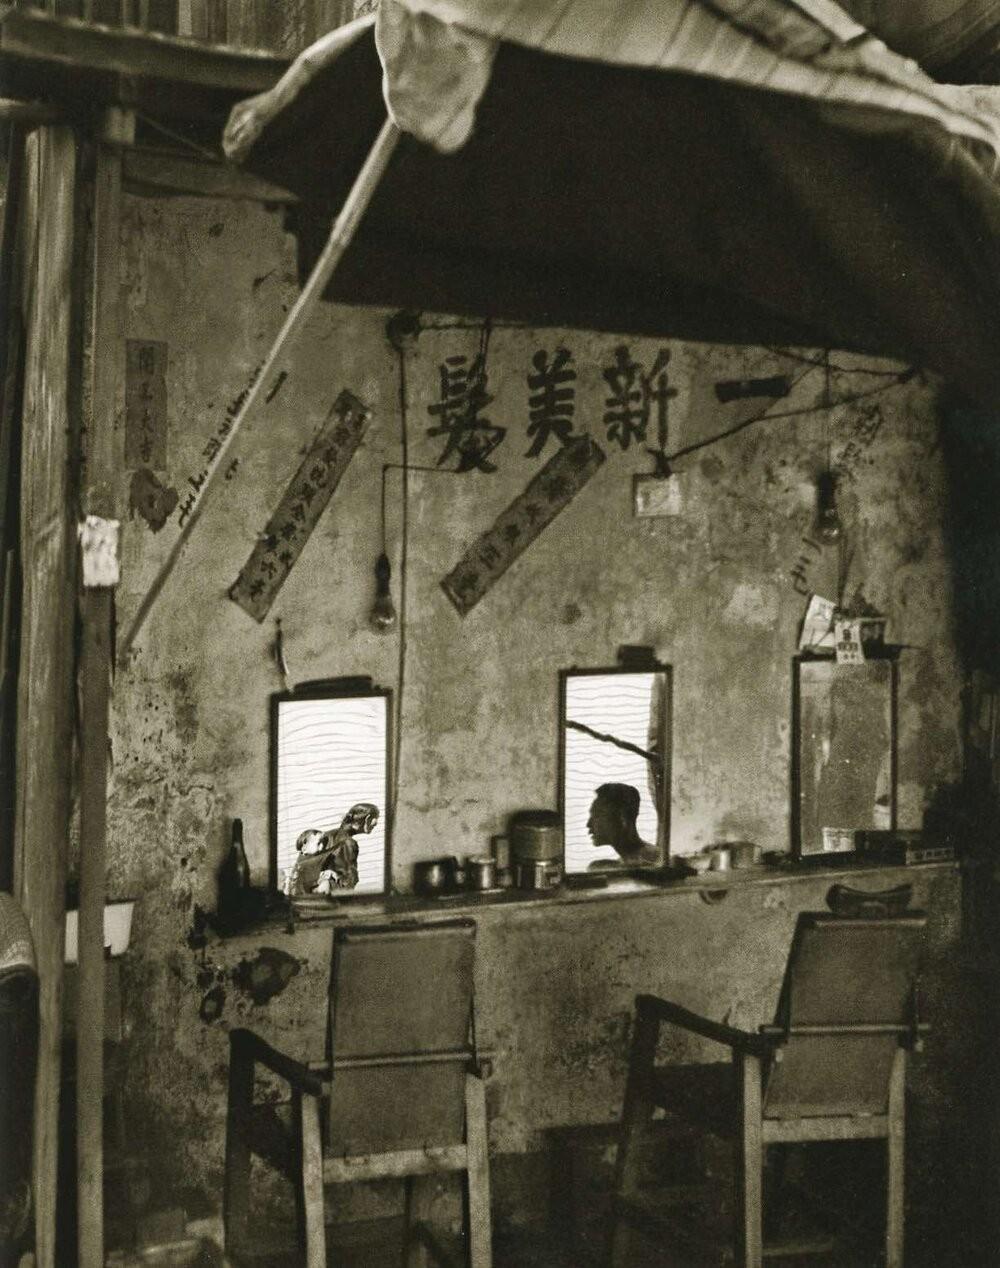 Парикмахерская на тротуаре, 1960. Автор Фан Хо